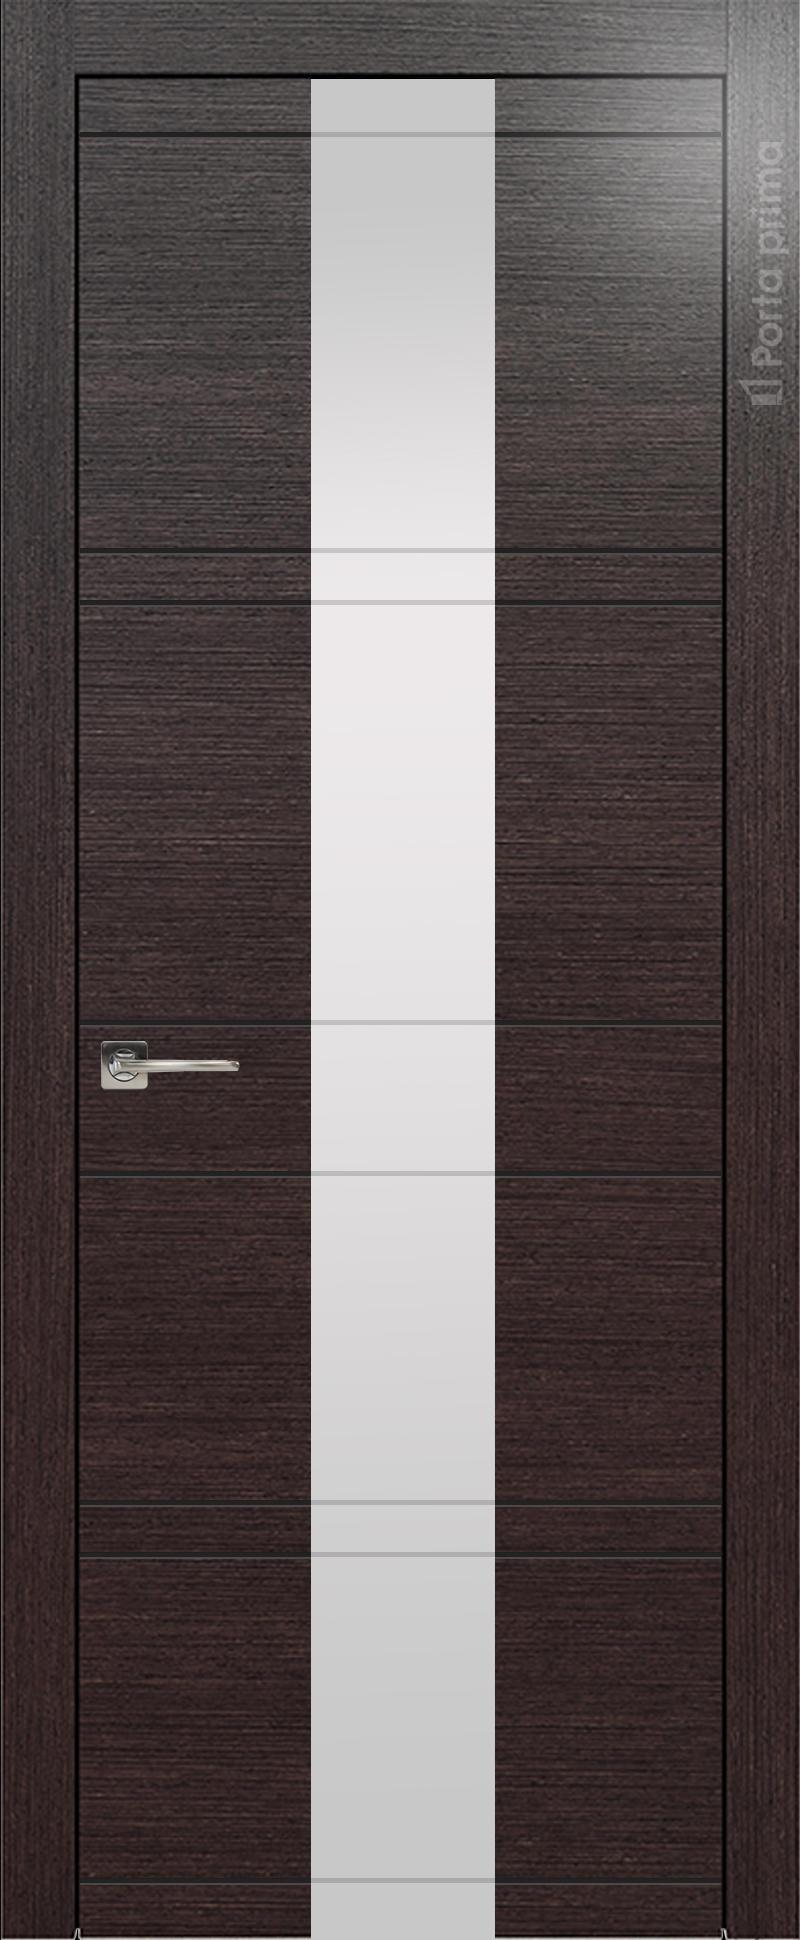 Tivoli Ж-2 цвет - Венге Шоколад Со стеклом (ДО)